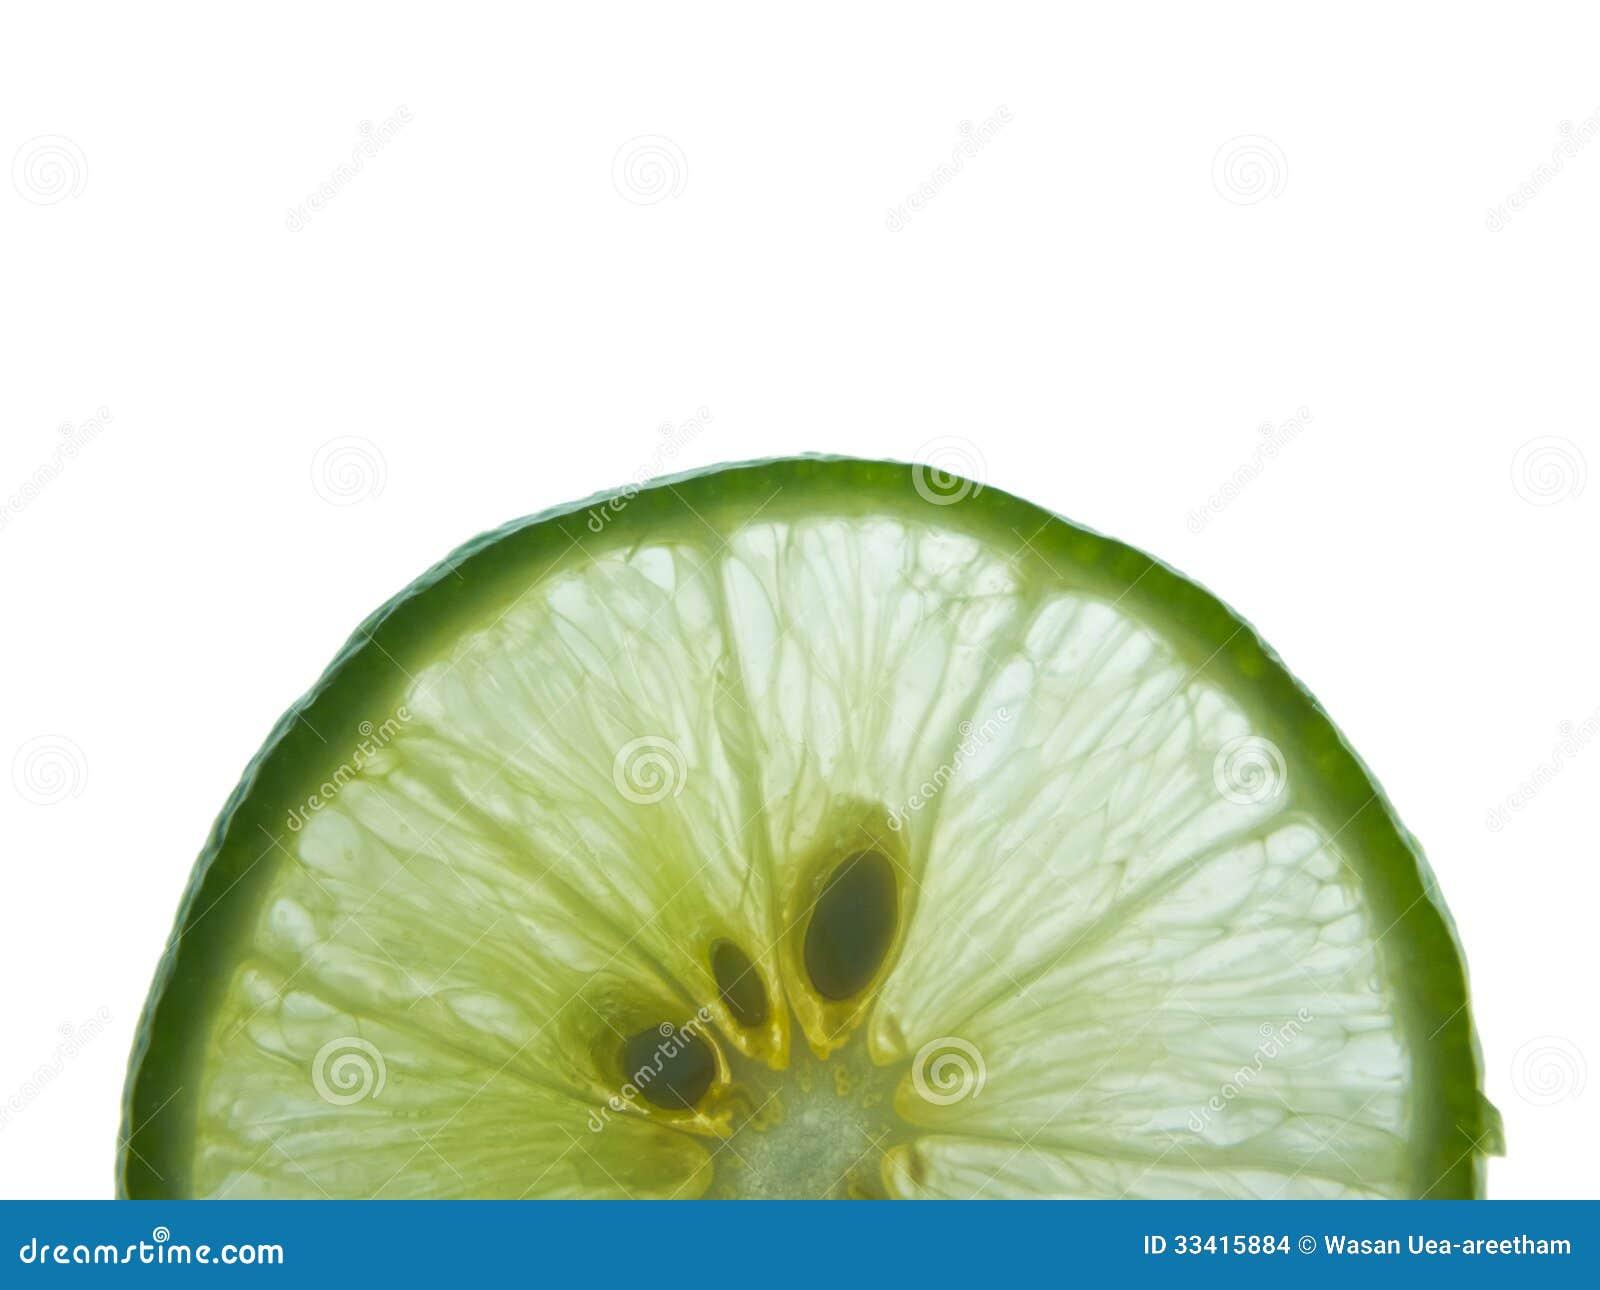 Lime Slice On White Background Stock Images - Image: 33415884